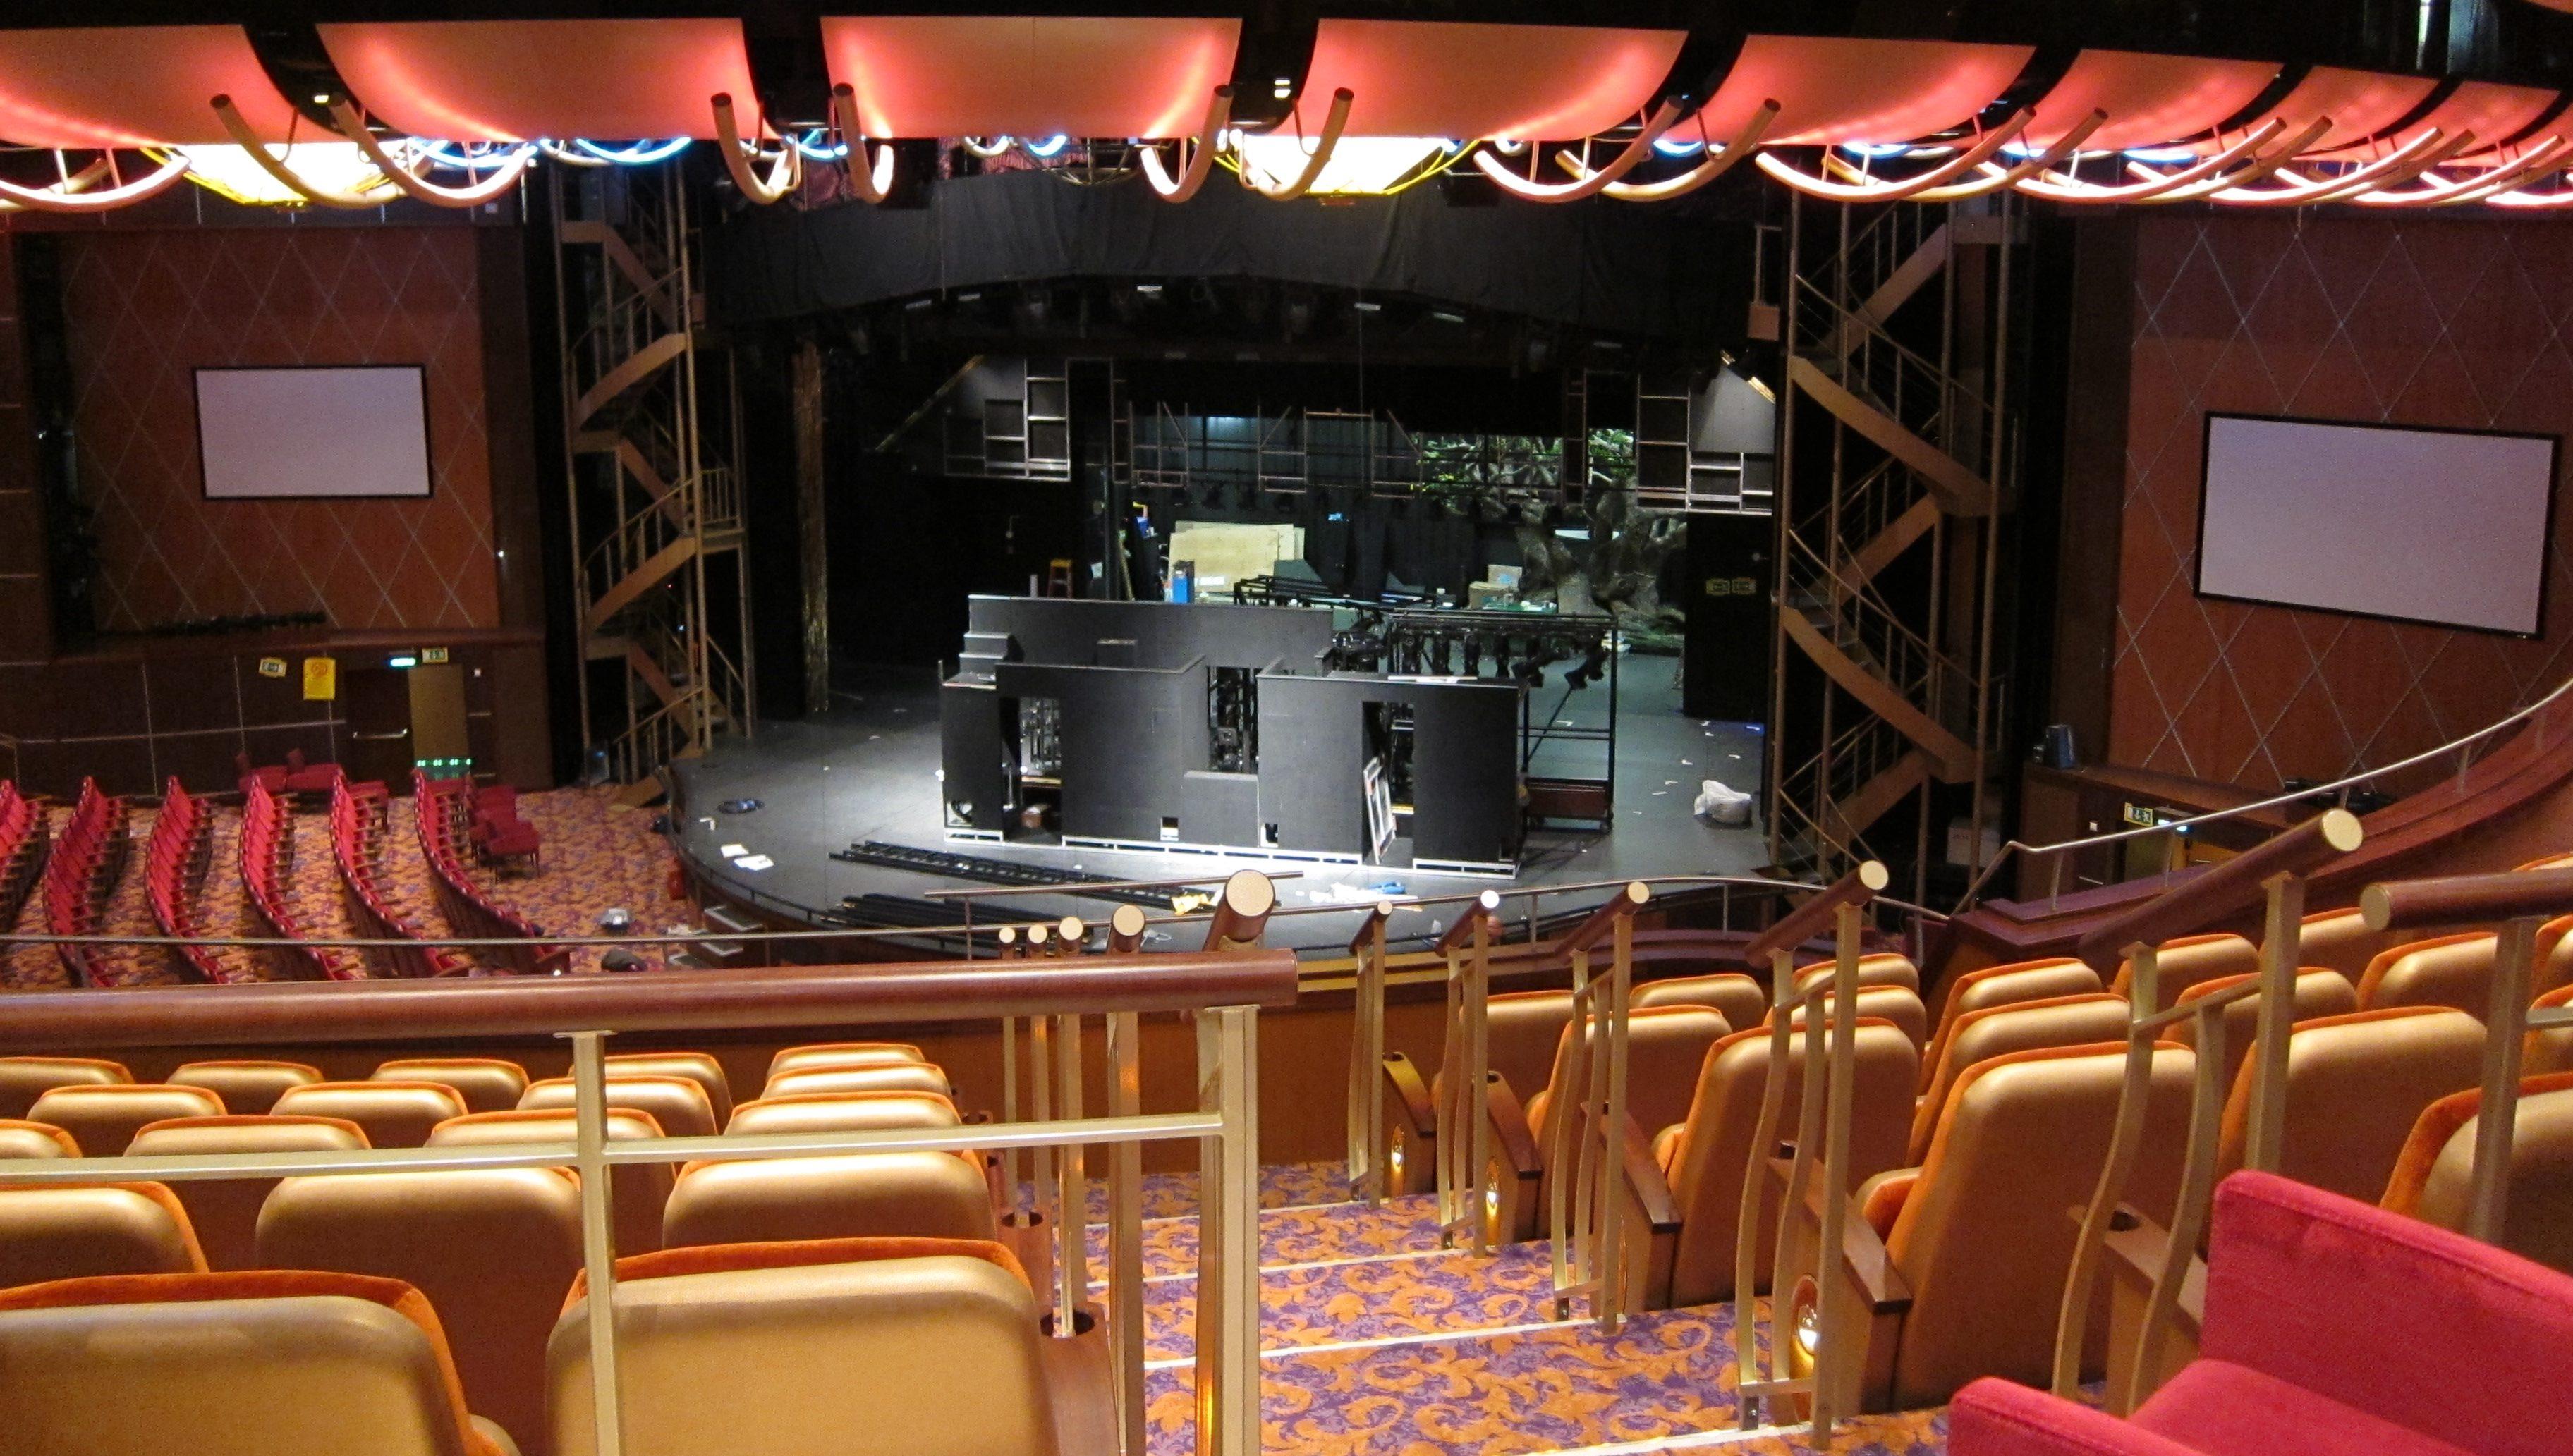 Allure_of_the_Seas_Theater-hq.jpg